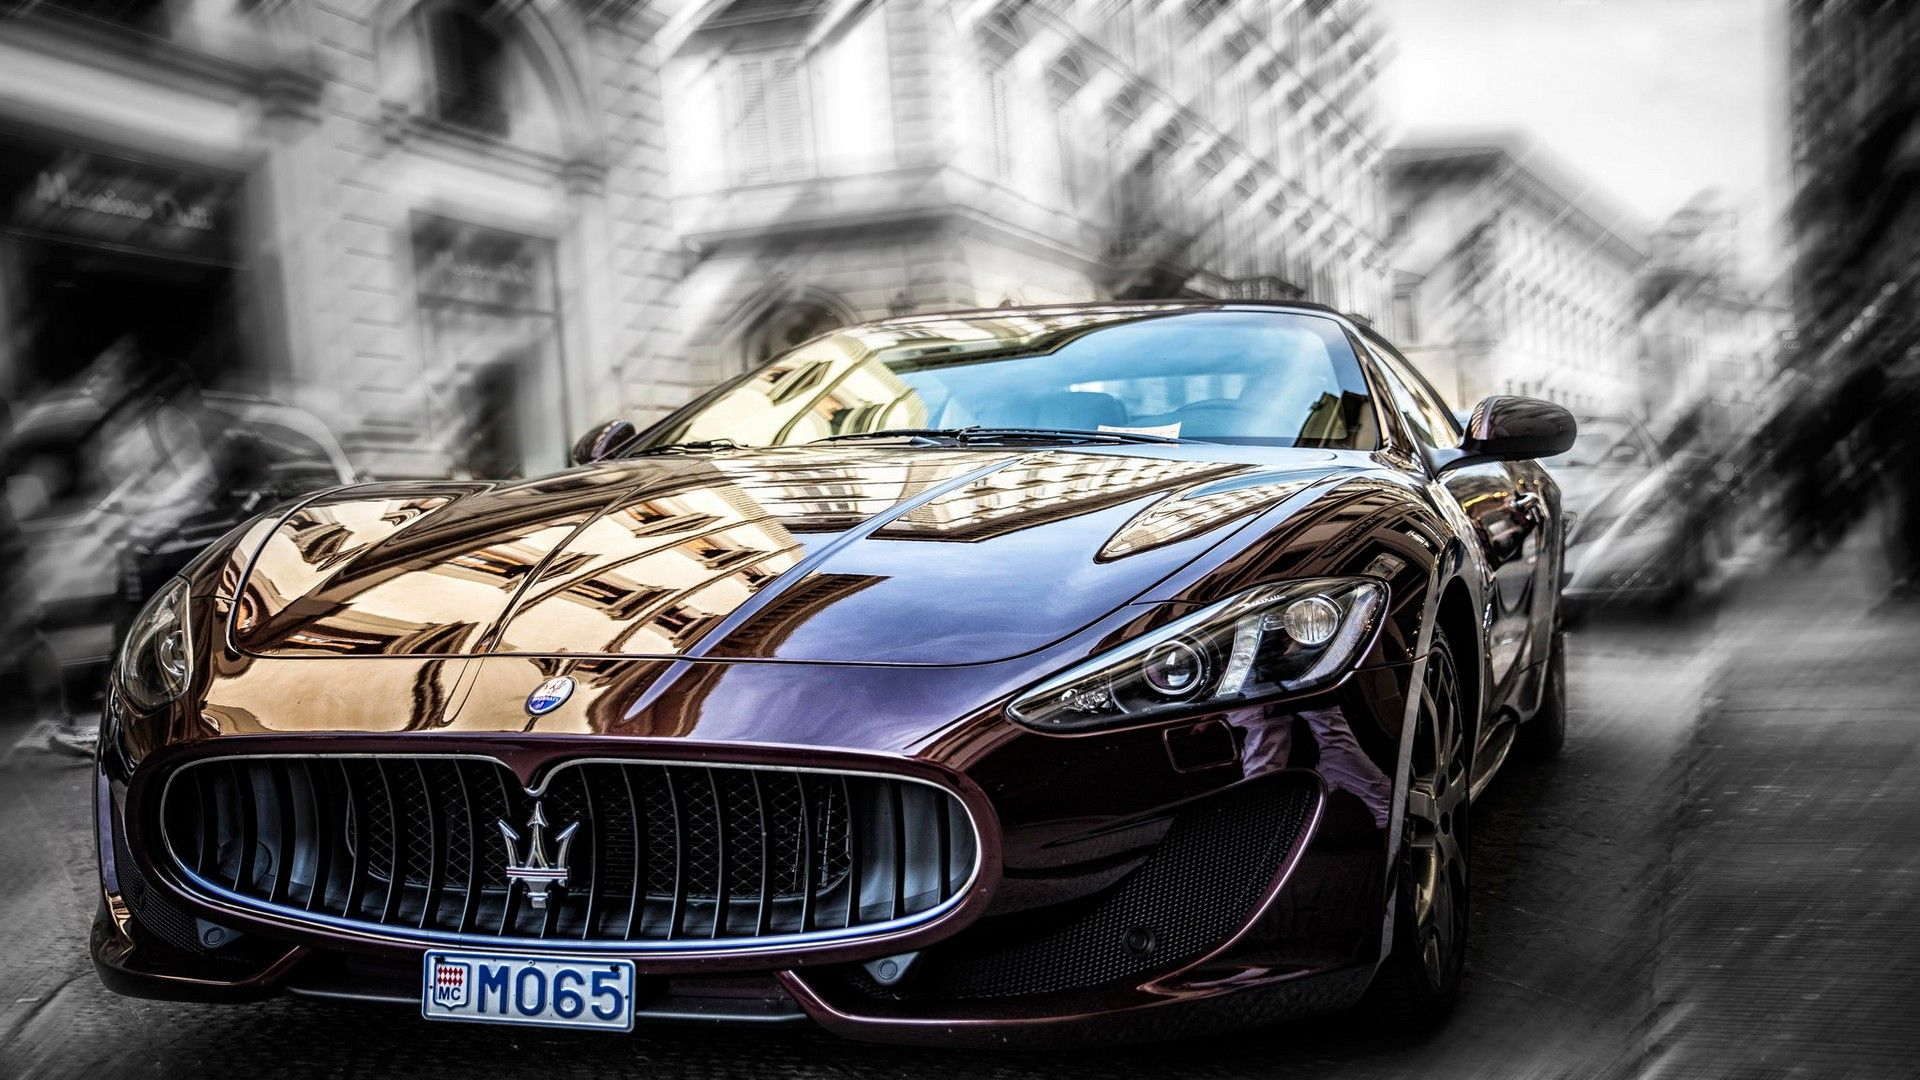 Maserati Granturismo S Mc Line Bw Cars Hd Wallpapers Maserati